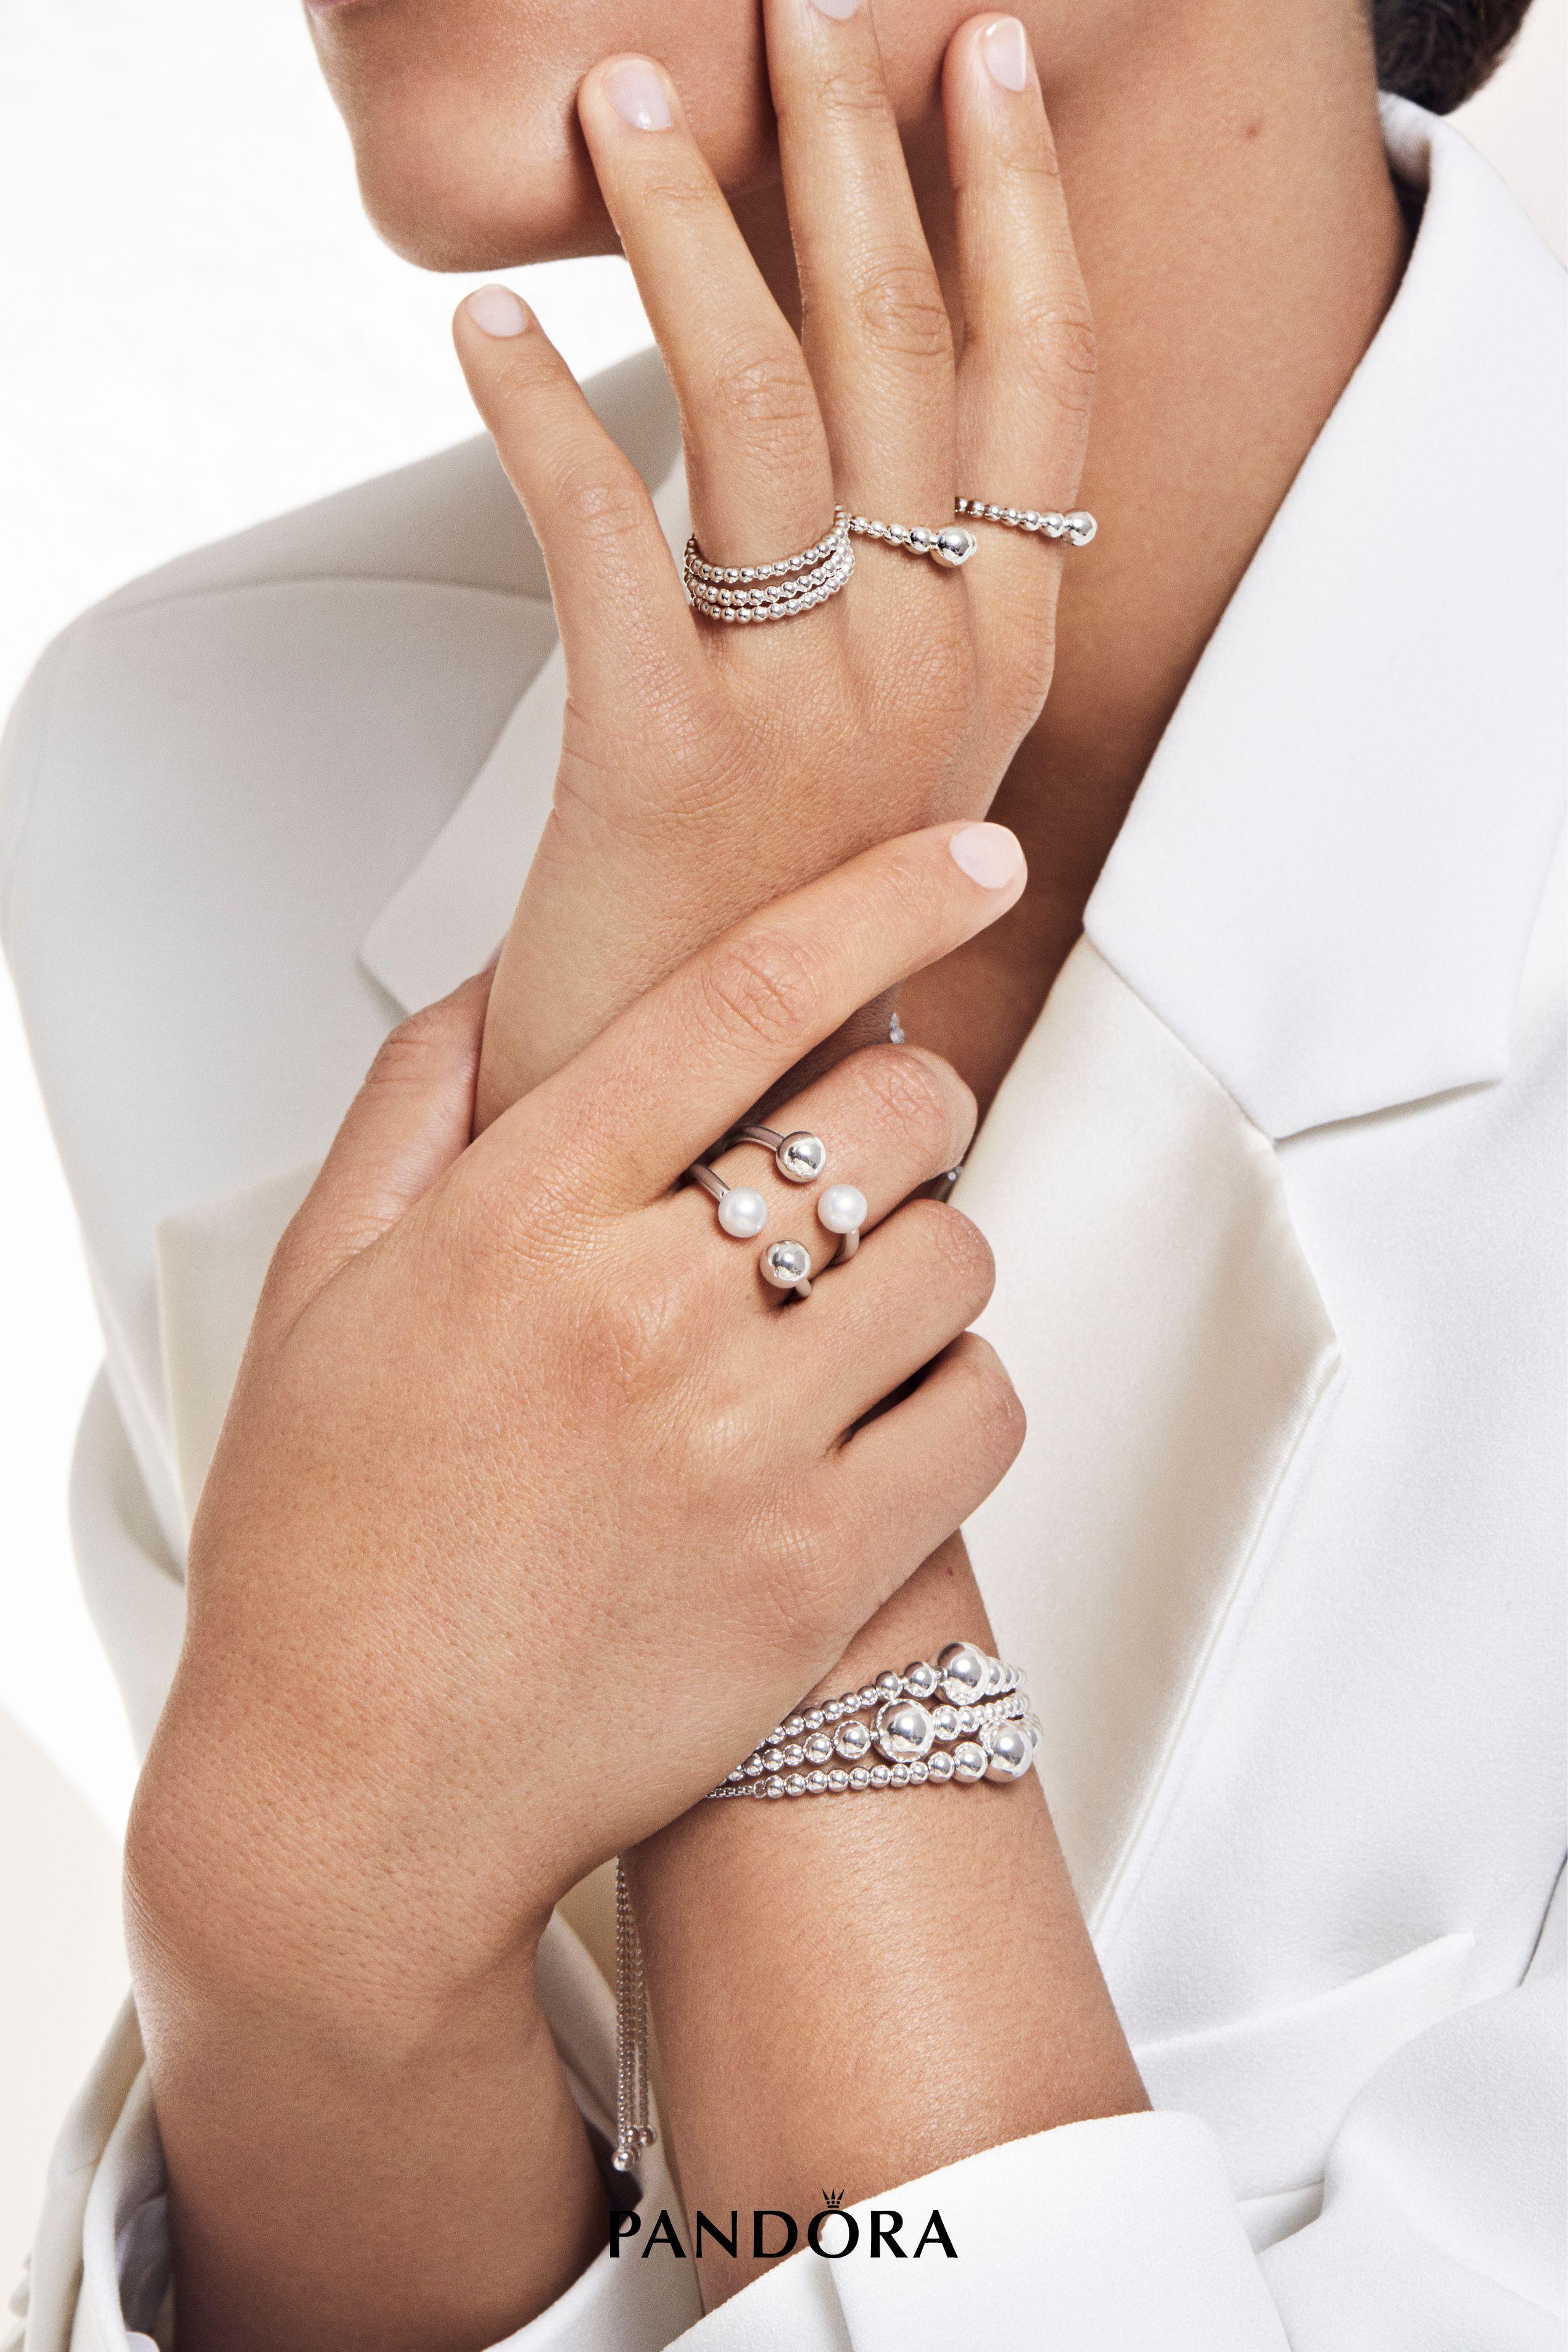 Presenting The New Purely Pandora Jewellery Collection Versatile